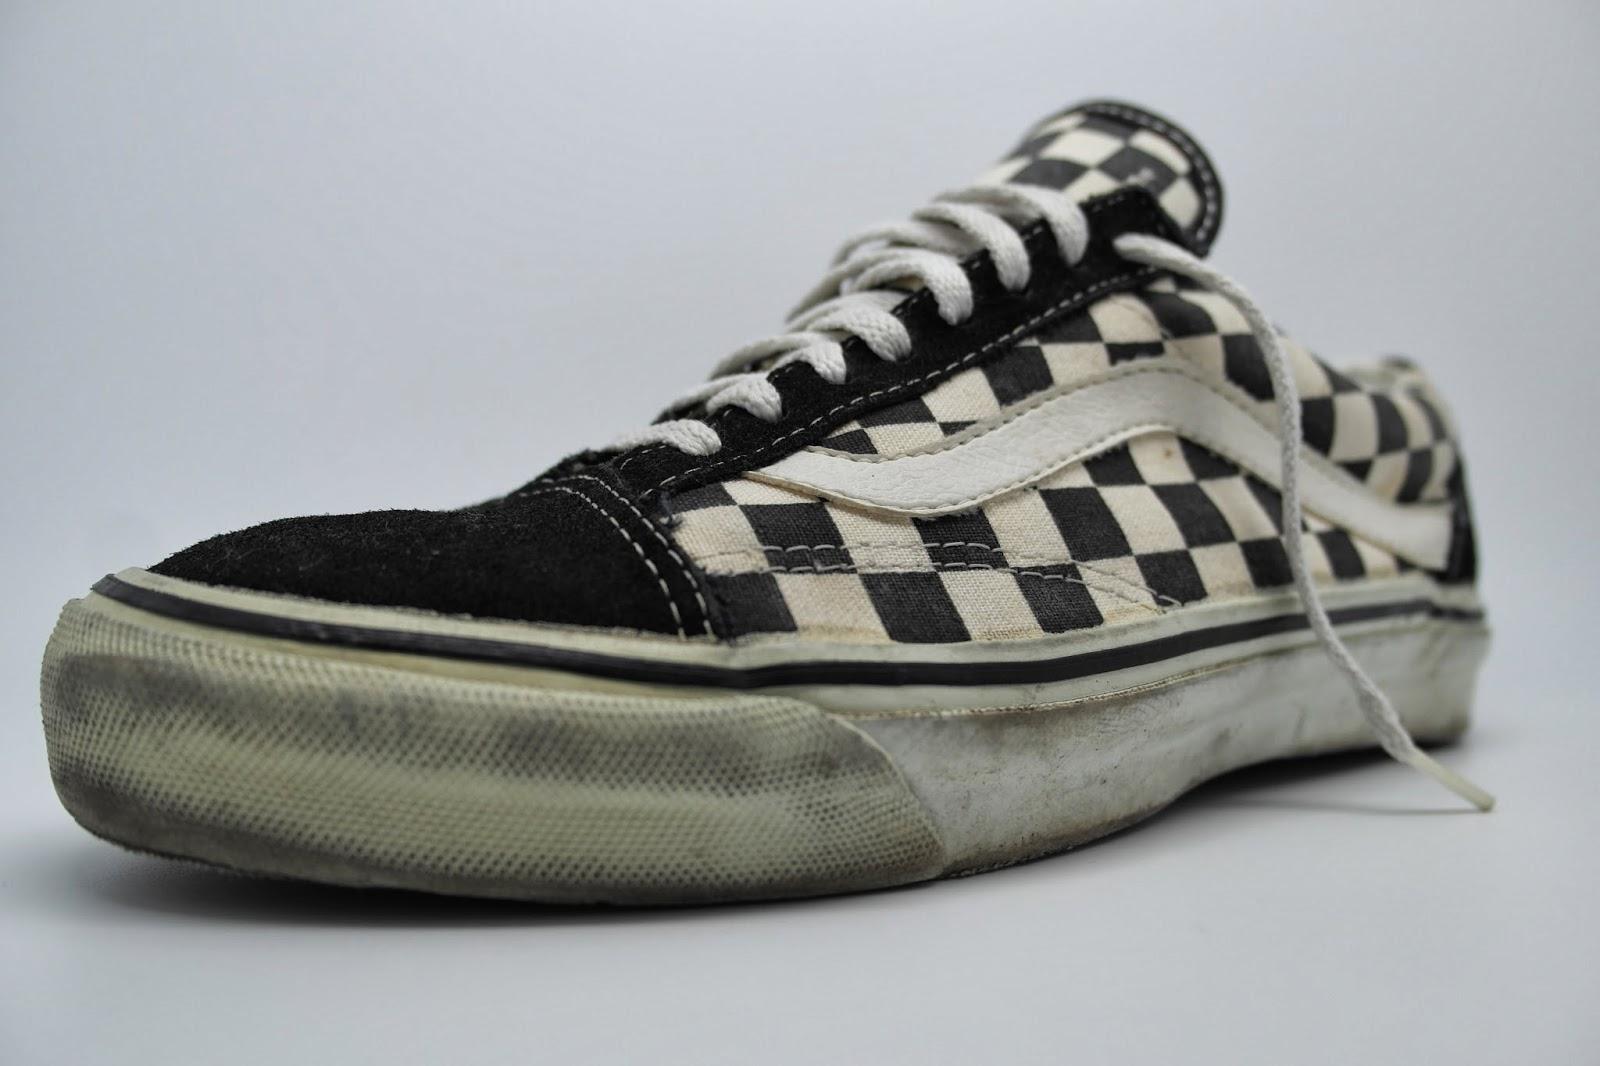 2b84230c75 vintage vans style  36 old skool black white checkerboard print made in usa  circa 1992 used. US9.5 UK8.5